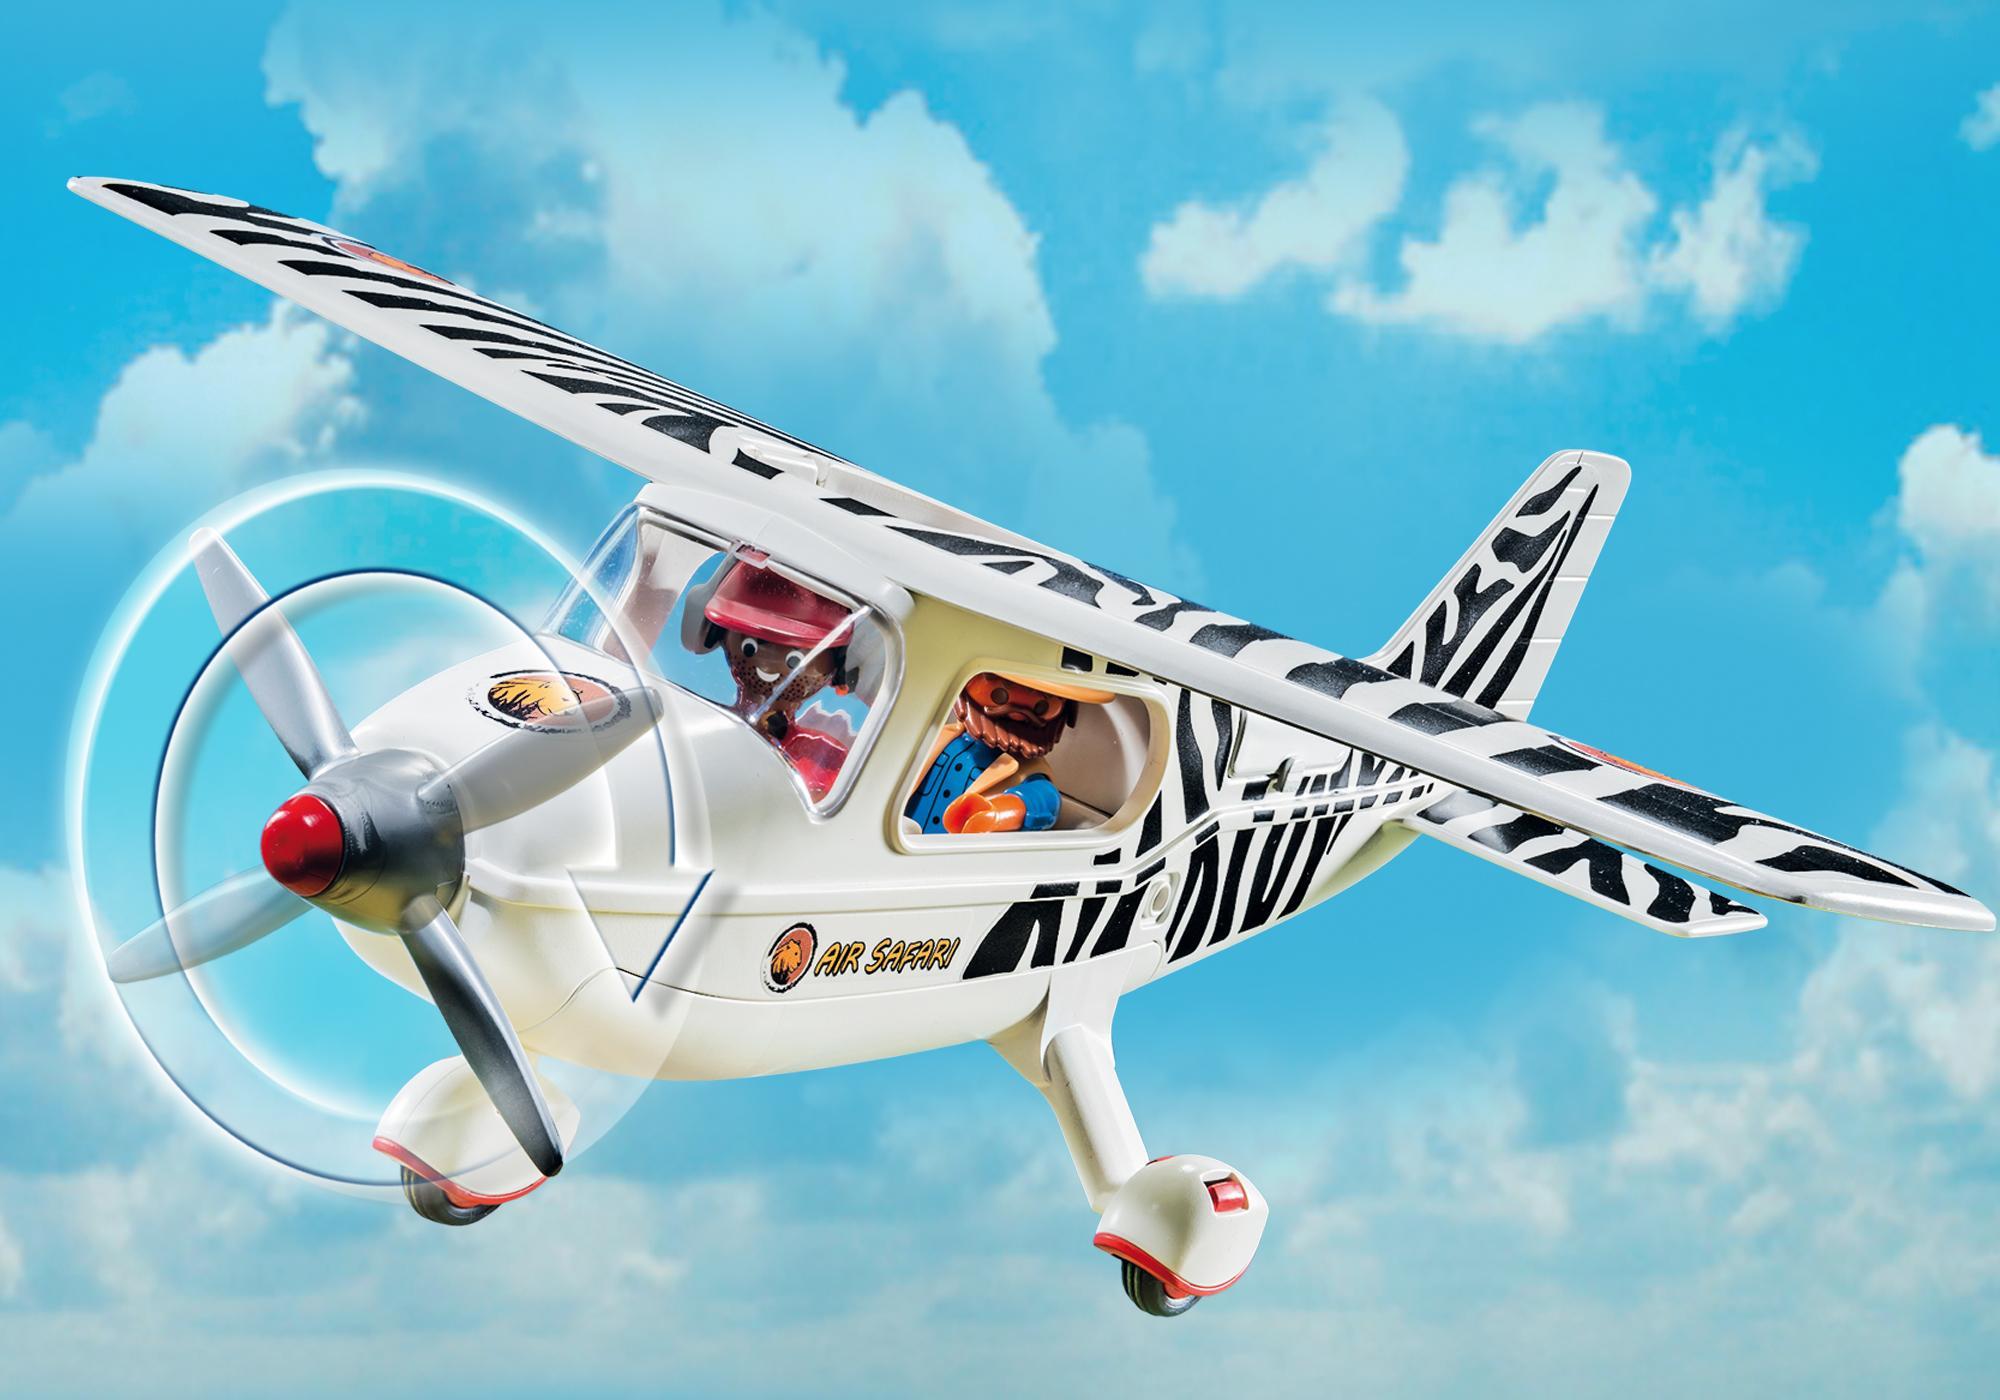 http://media.playmobil.com/i/playmobil/6938_product_extra2/Aereo di avvistamento fly-safari